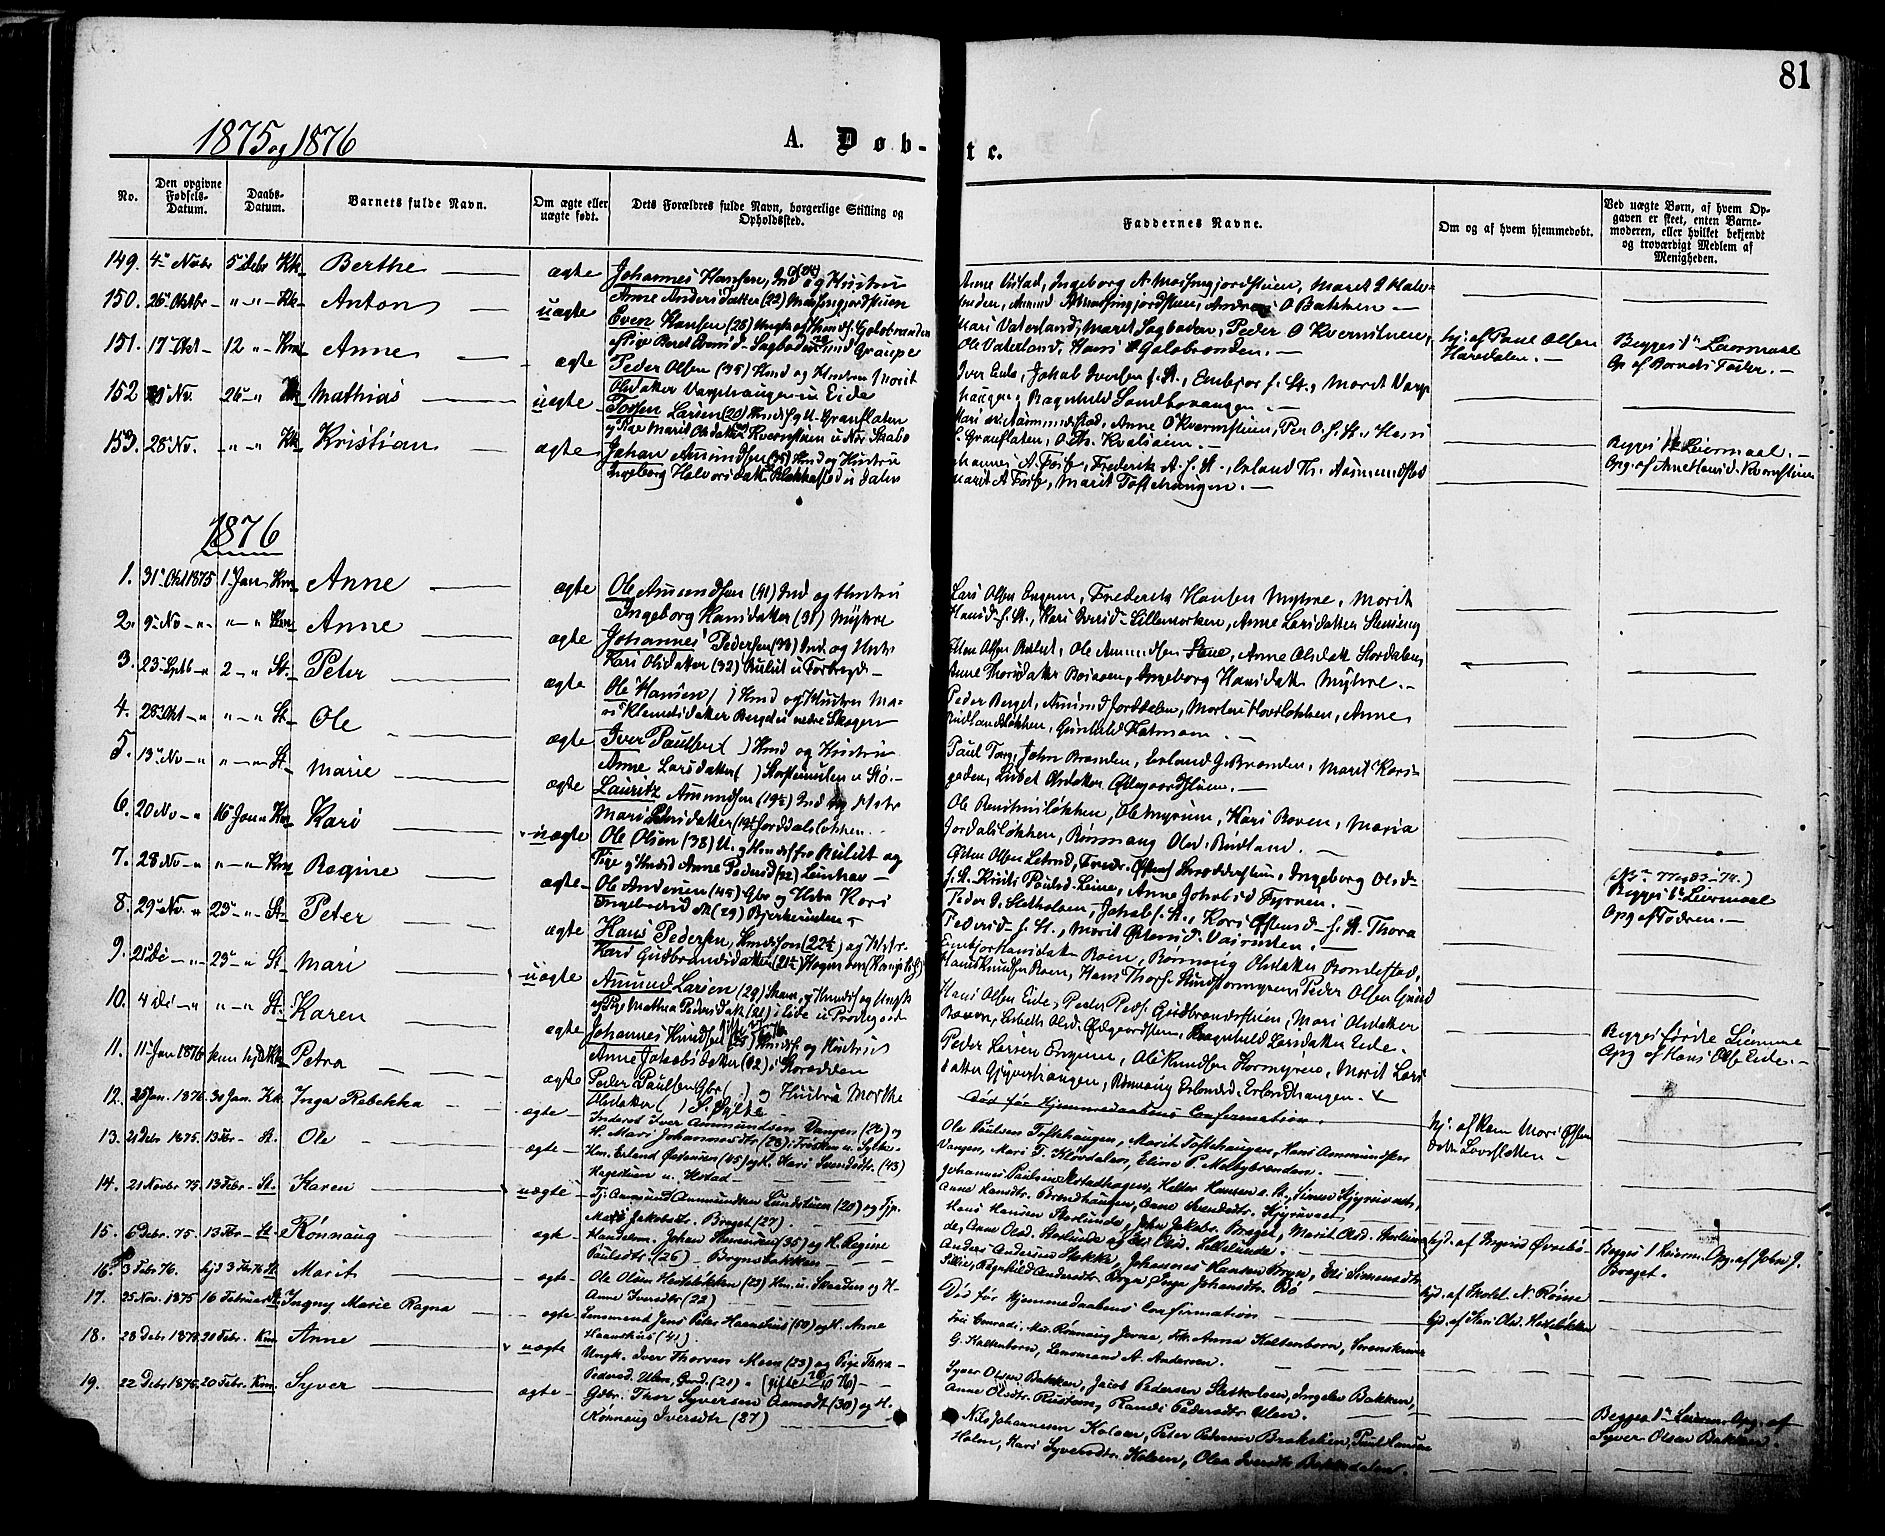 SAH, Nord-Fron prestekontor, Ministerialbok nr. 2, 1865-1883, s. 81